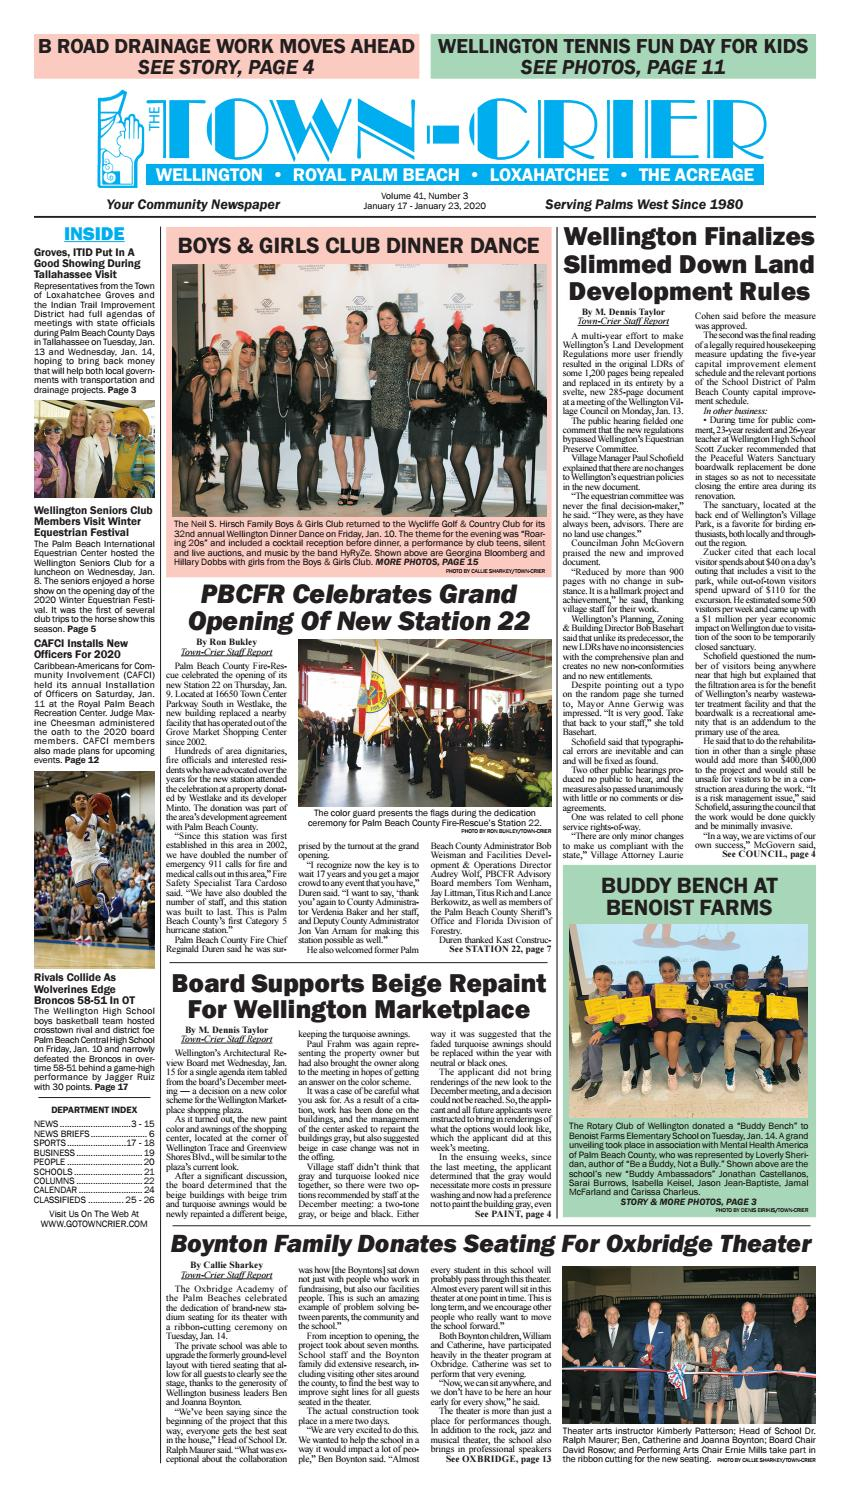 Town Crier Newspaper January 17, 2020Wellington The For Palm Beach County Auction Calendar